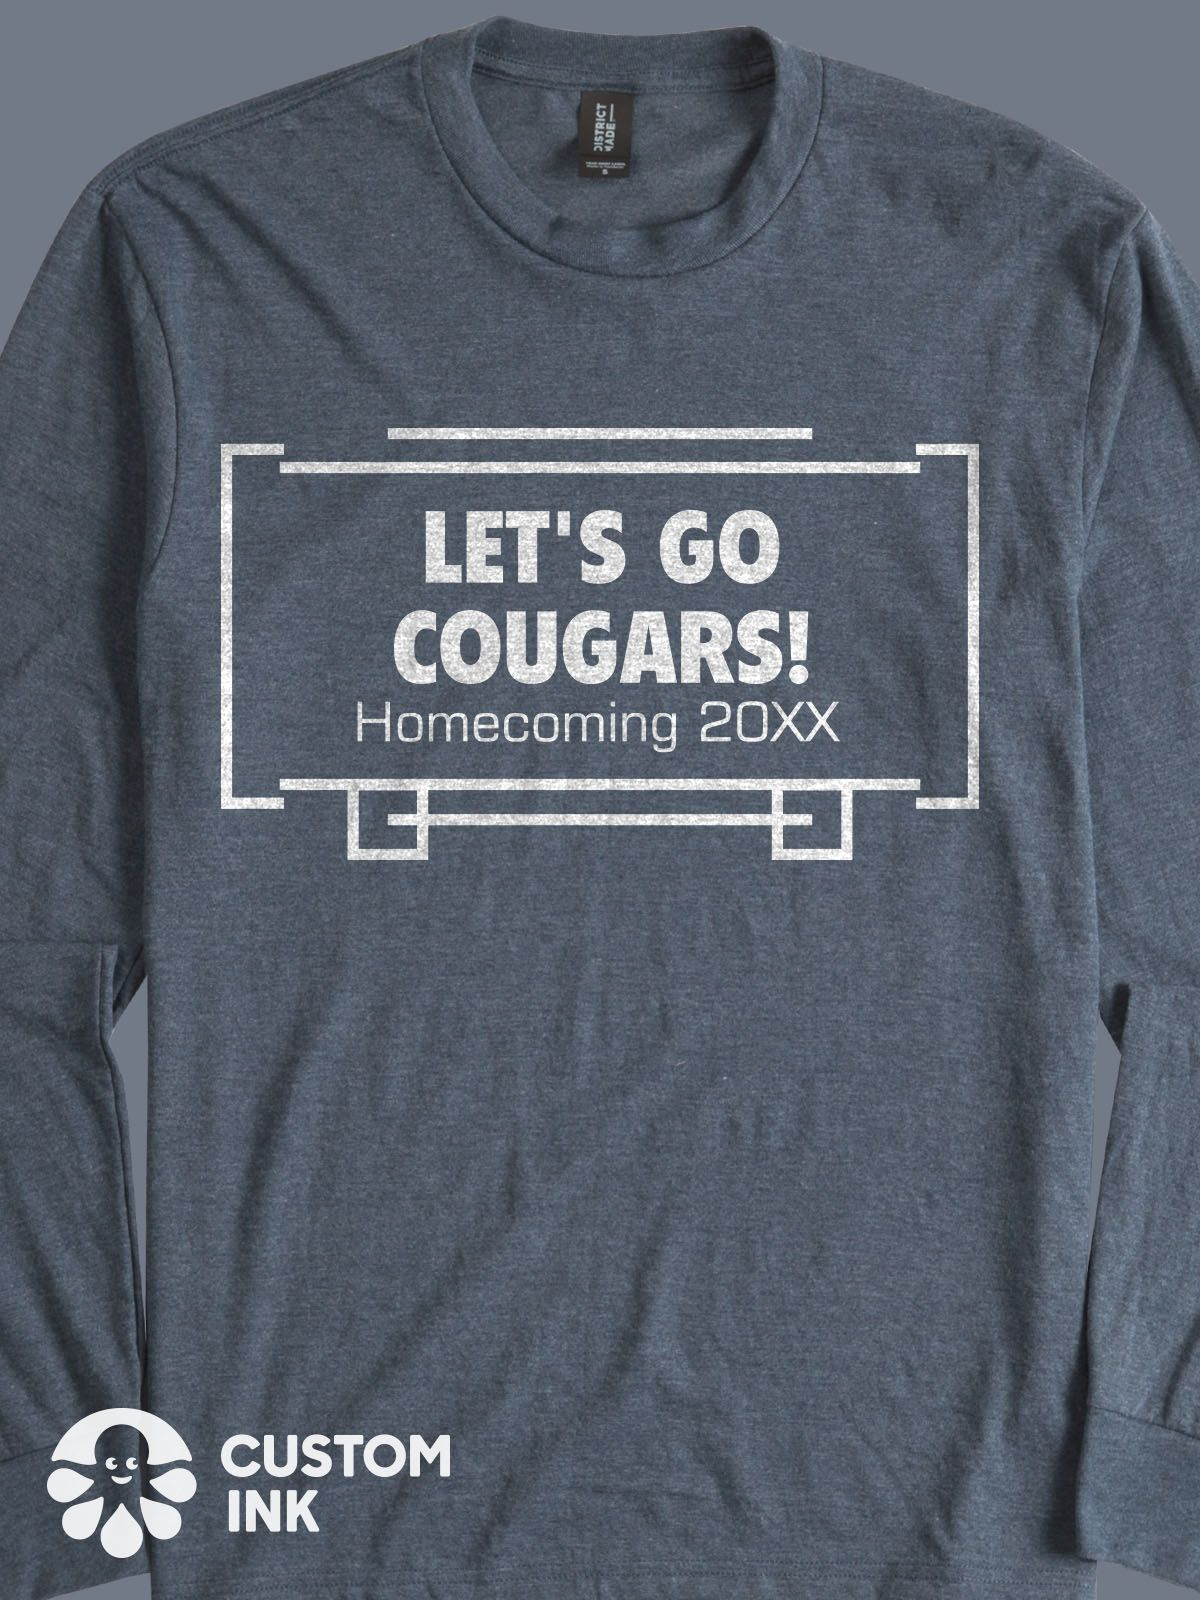 Homecoming custom shirt design idea for k12, high school, middle ...